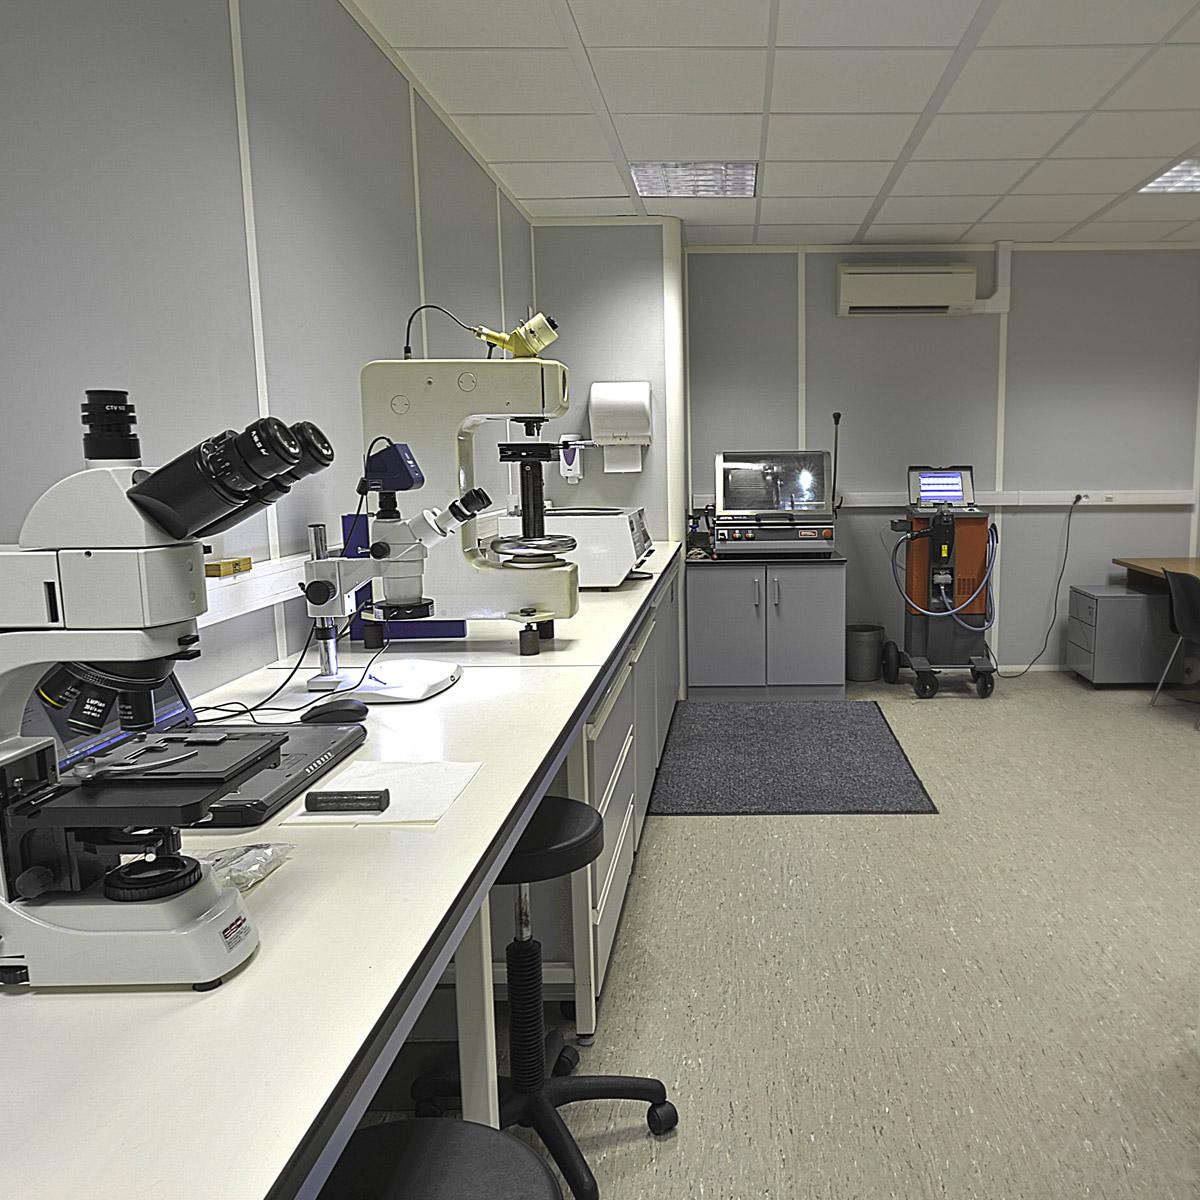 metallurgical-microscopes